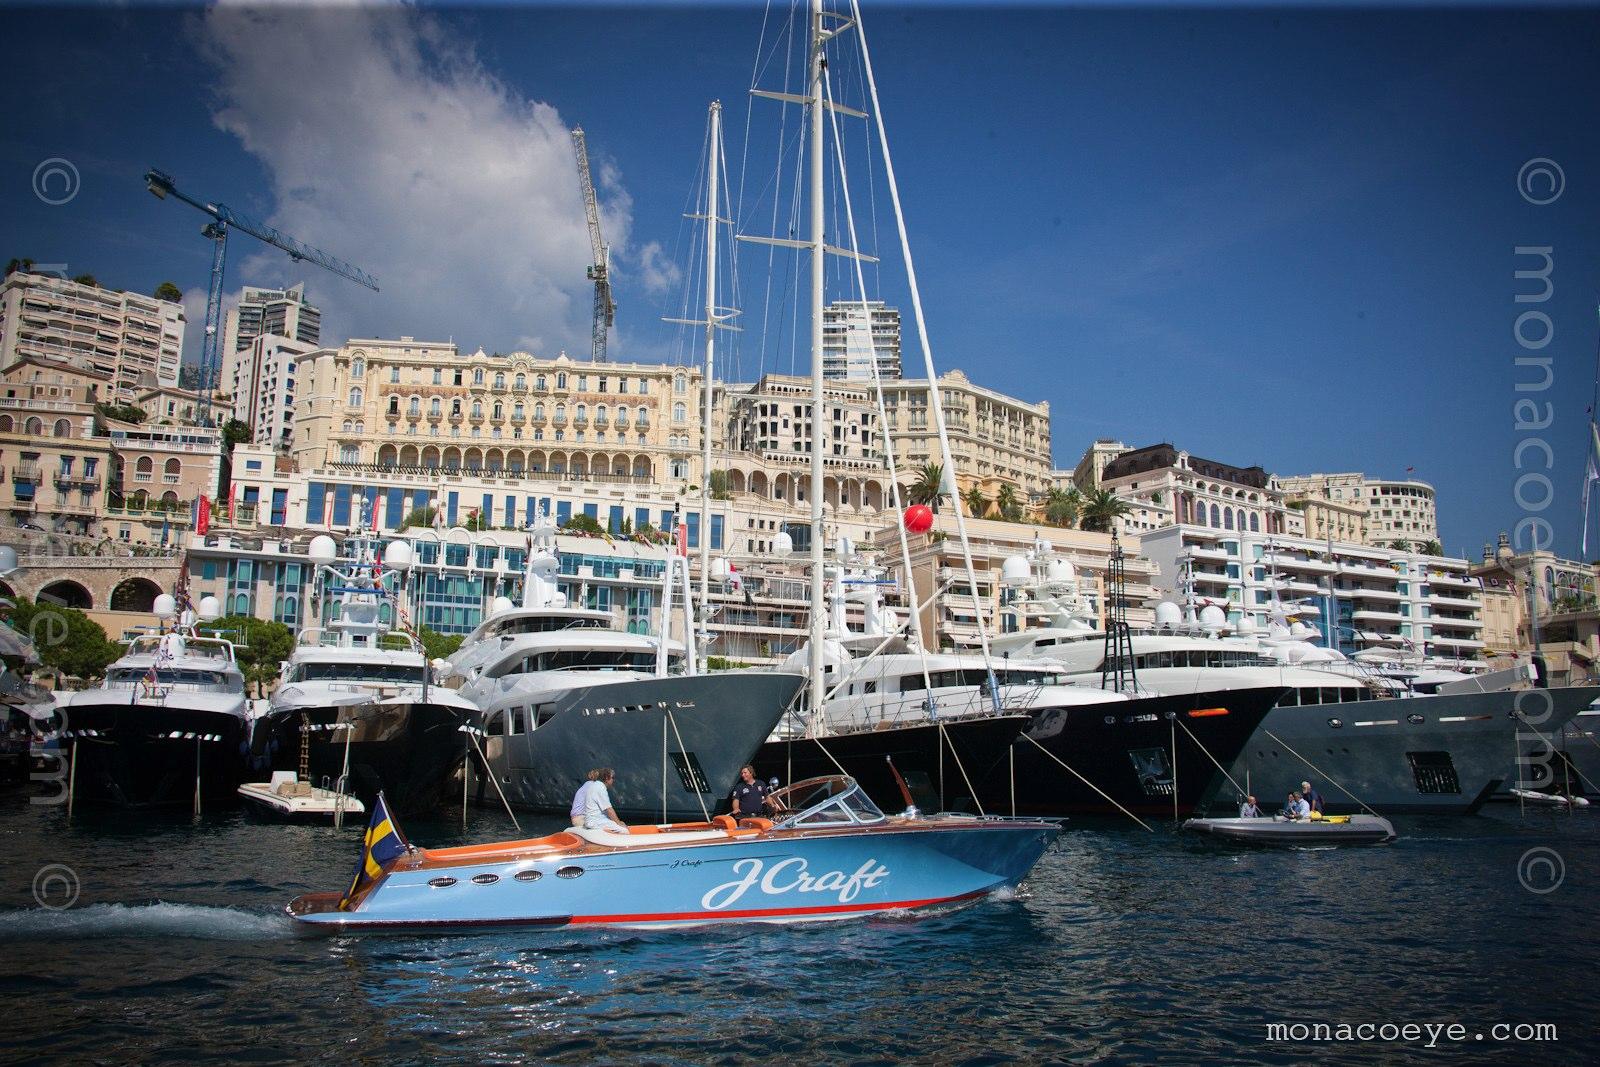 Monaco Yacht Show 2010, J Craft Torpedo